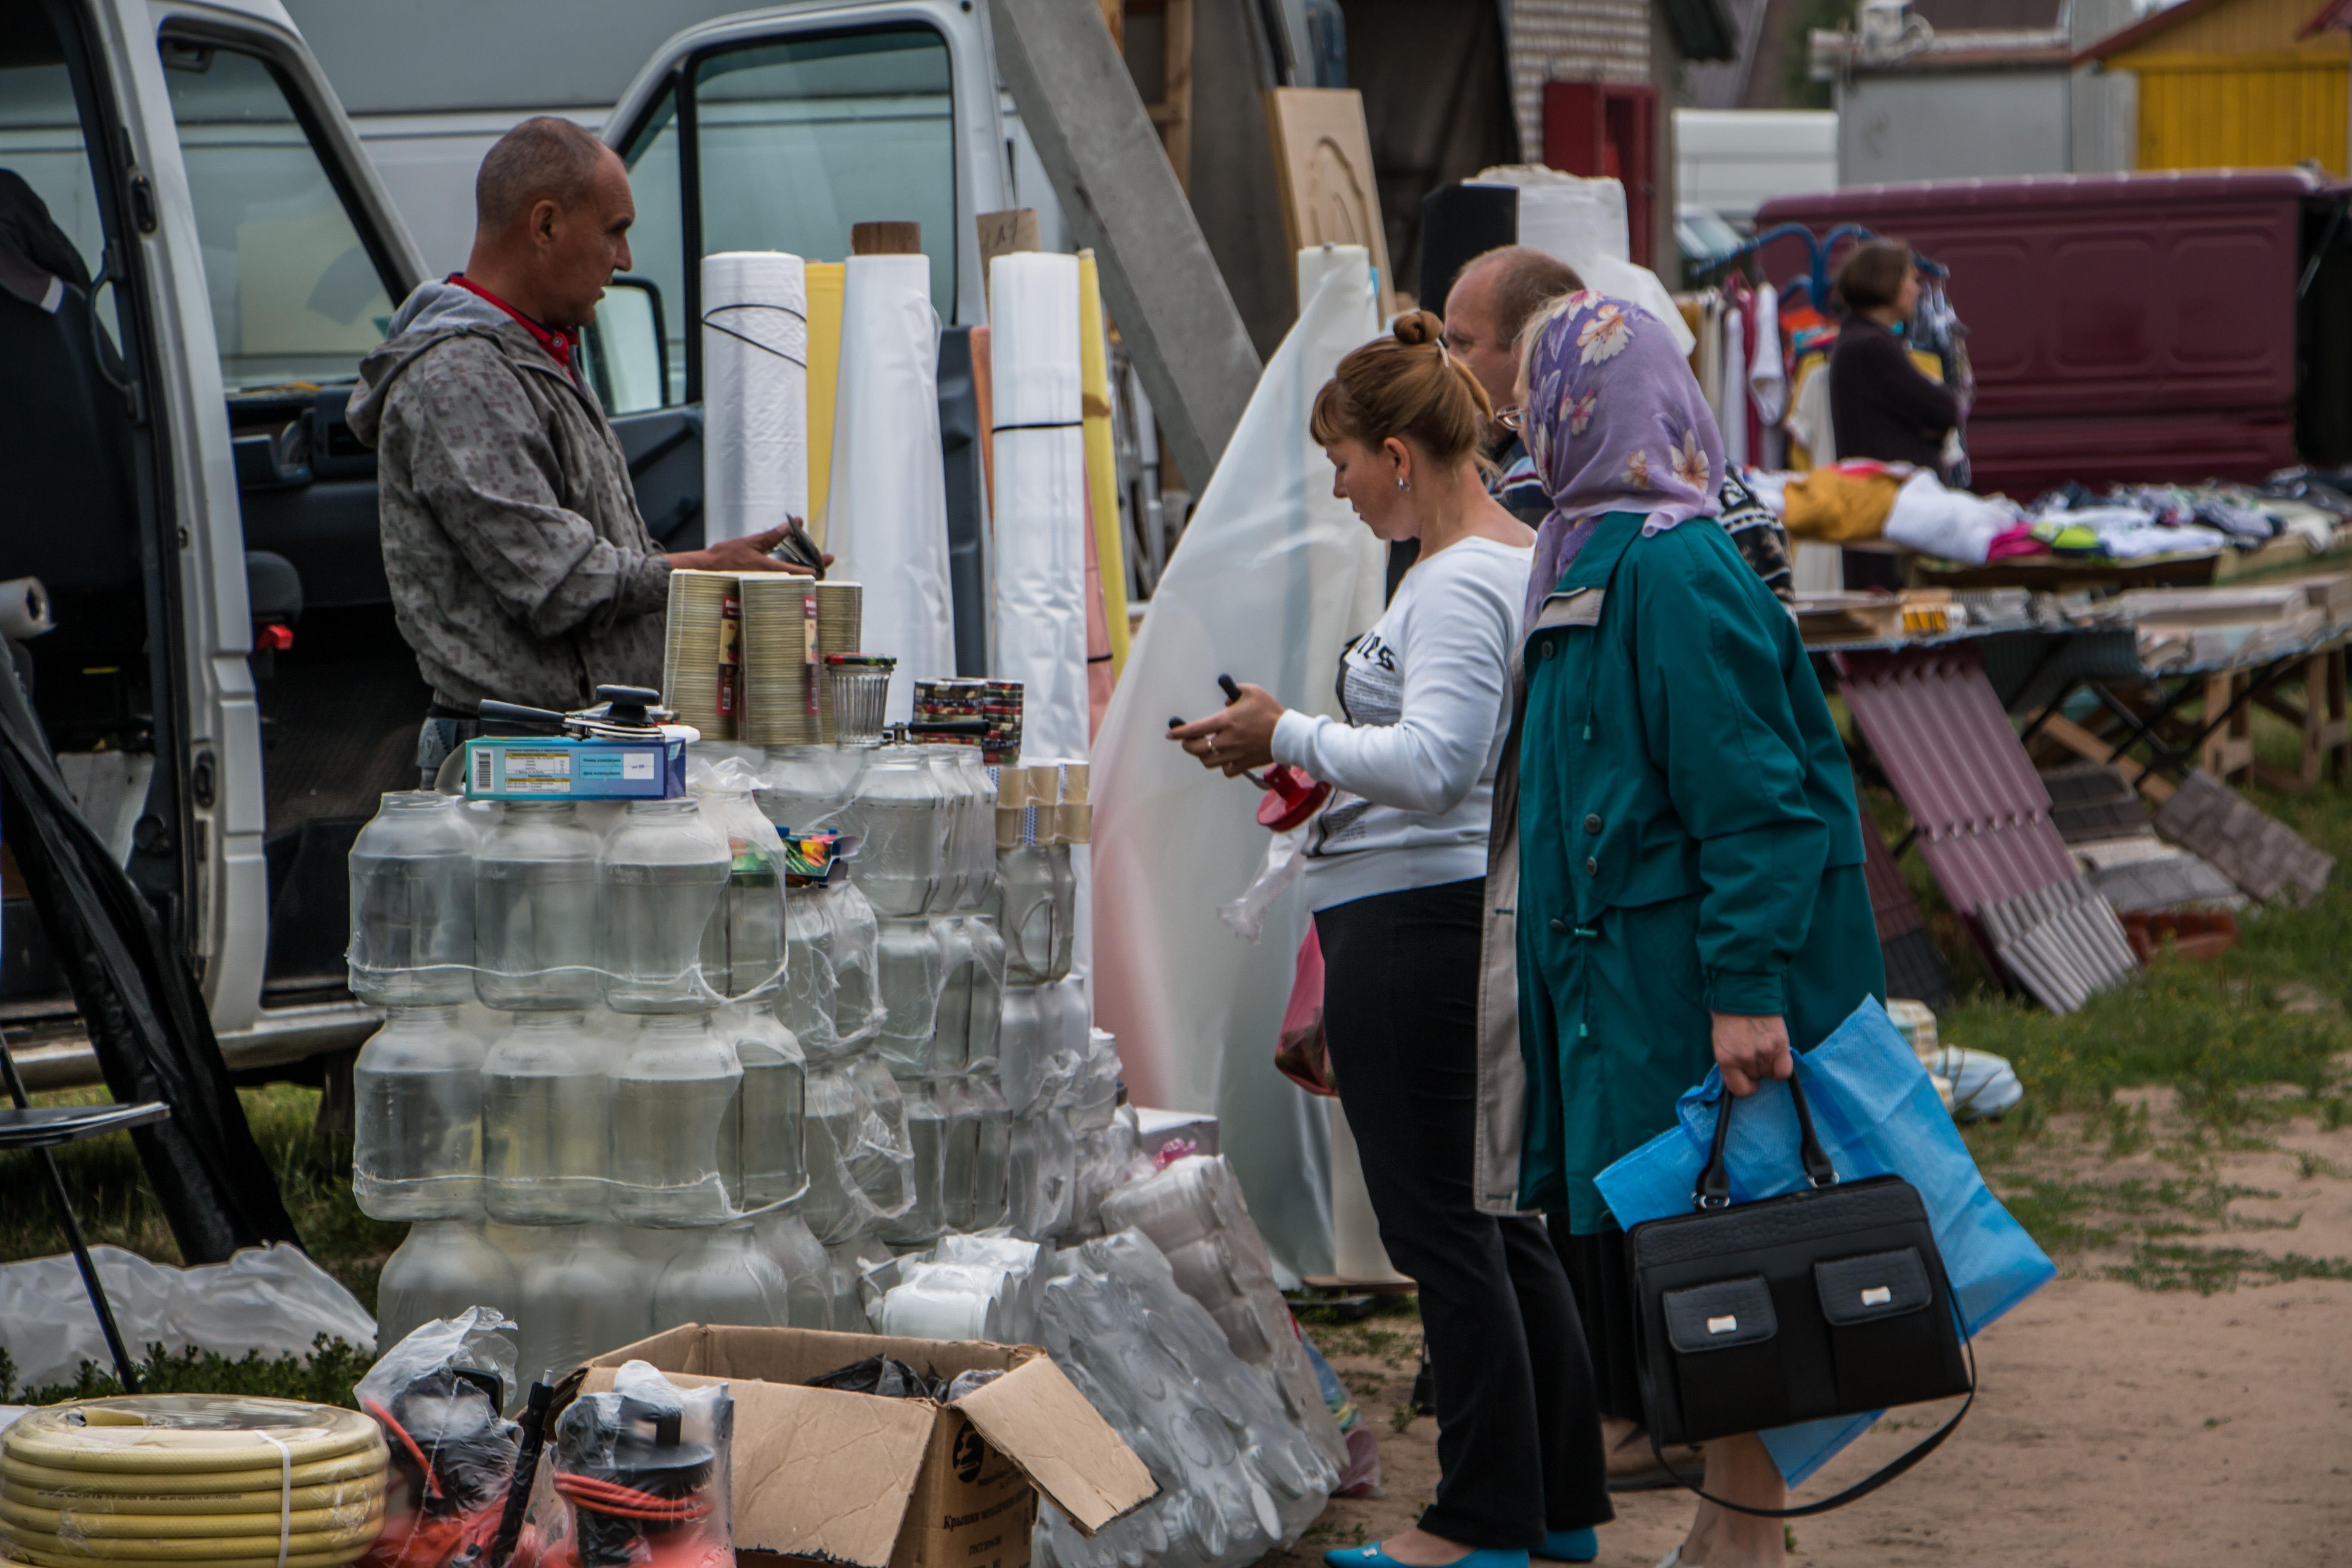 Glass jars stand, Business, Glass, Goods, Jars, HQ Photo